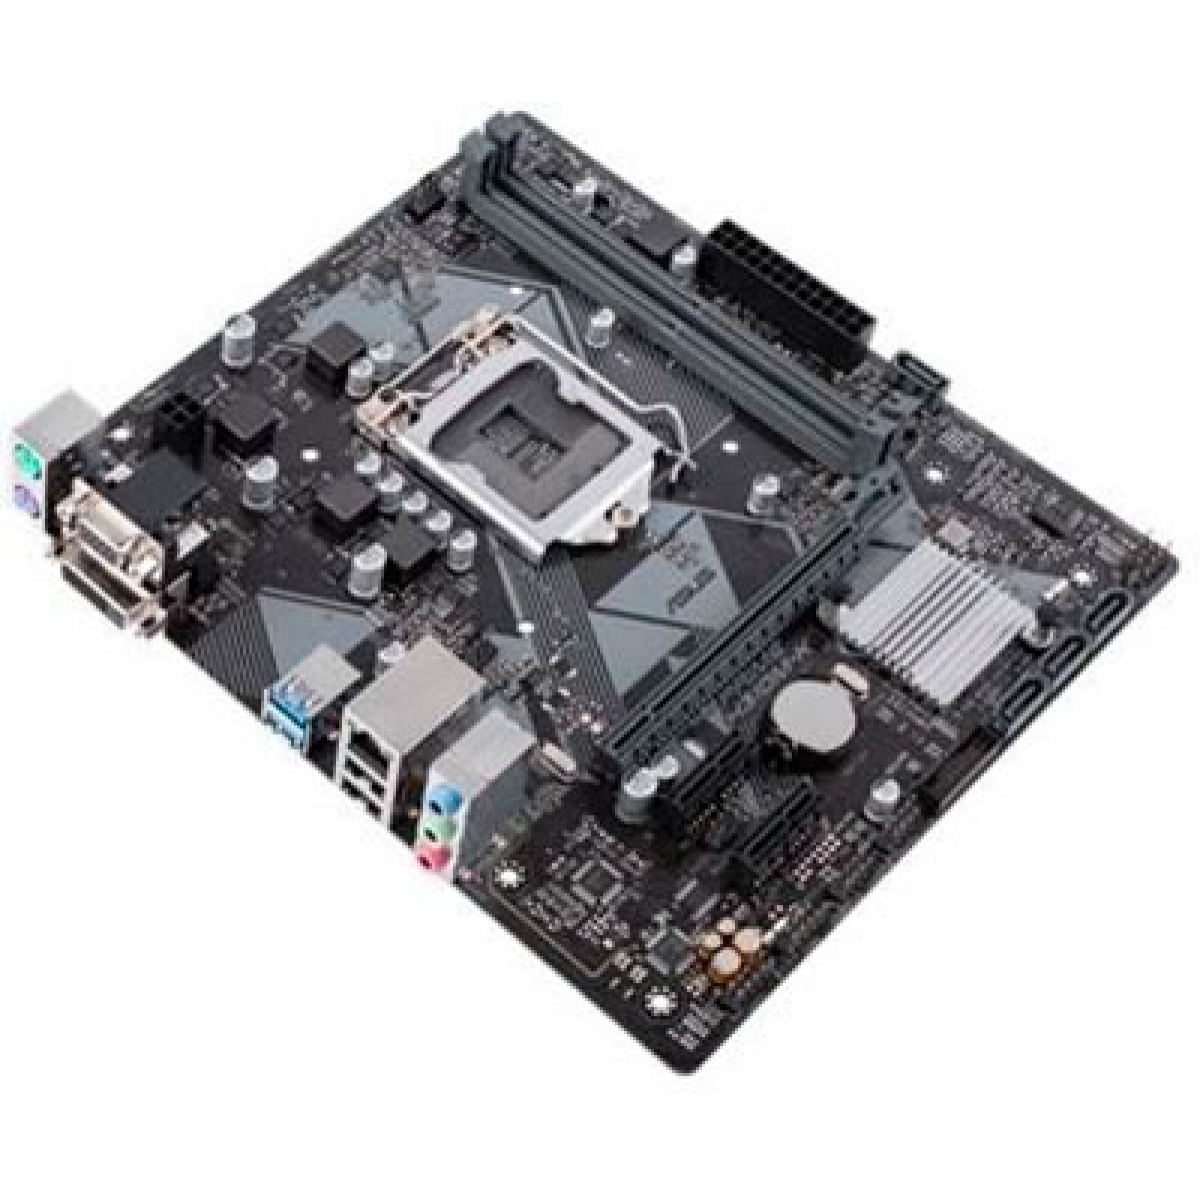 PLACA MÃE ASUS PRIME H310M-K, Chipset H310, Intel LGA 1151, mATX, DDR4